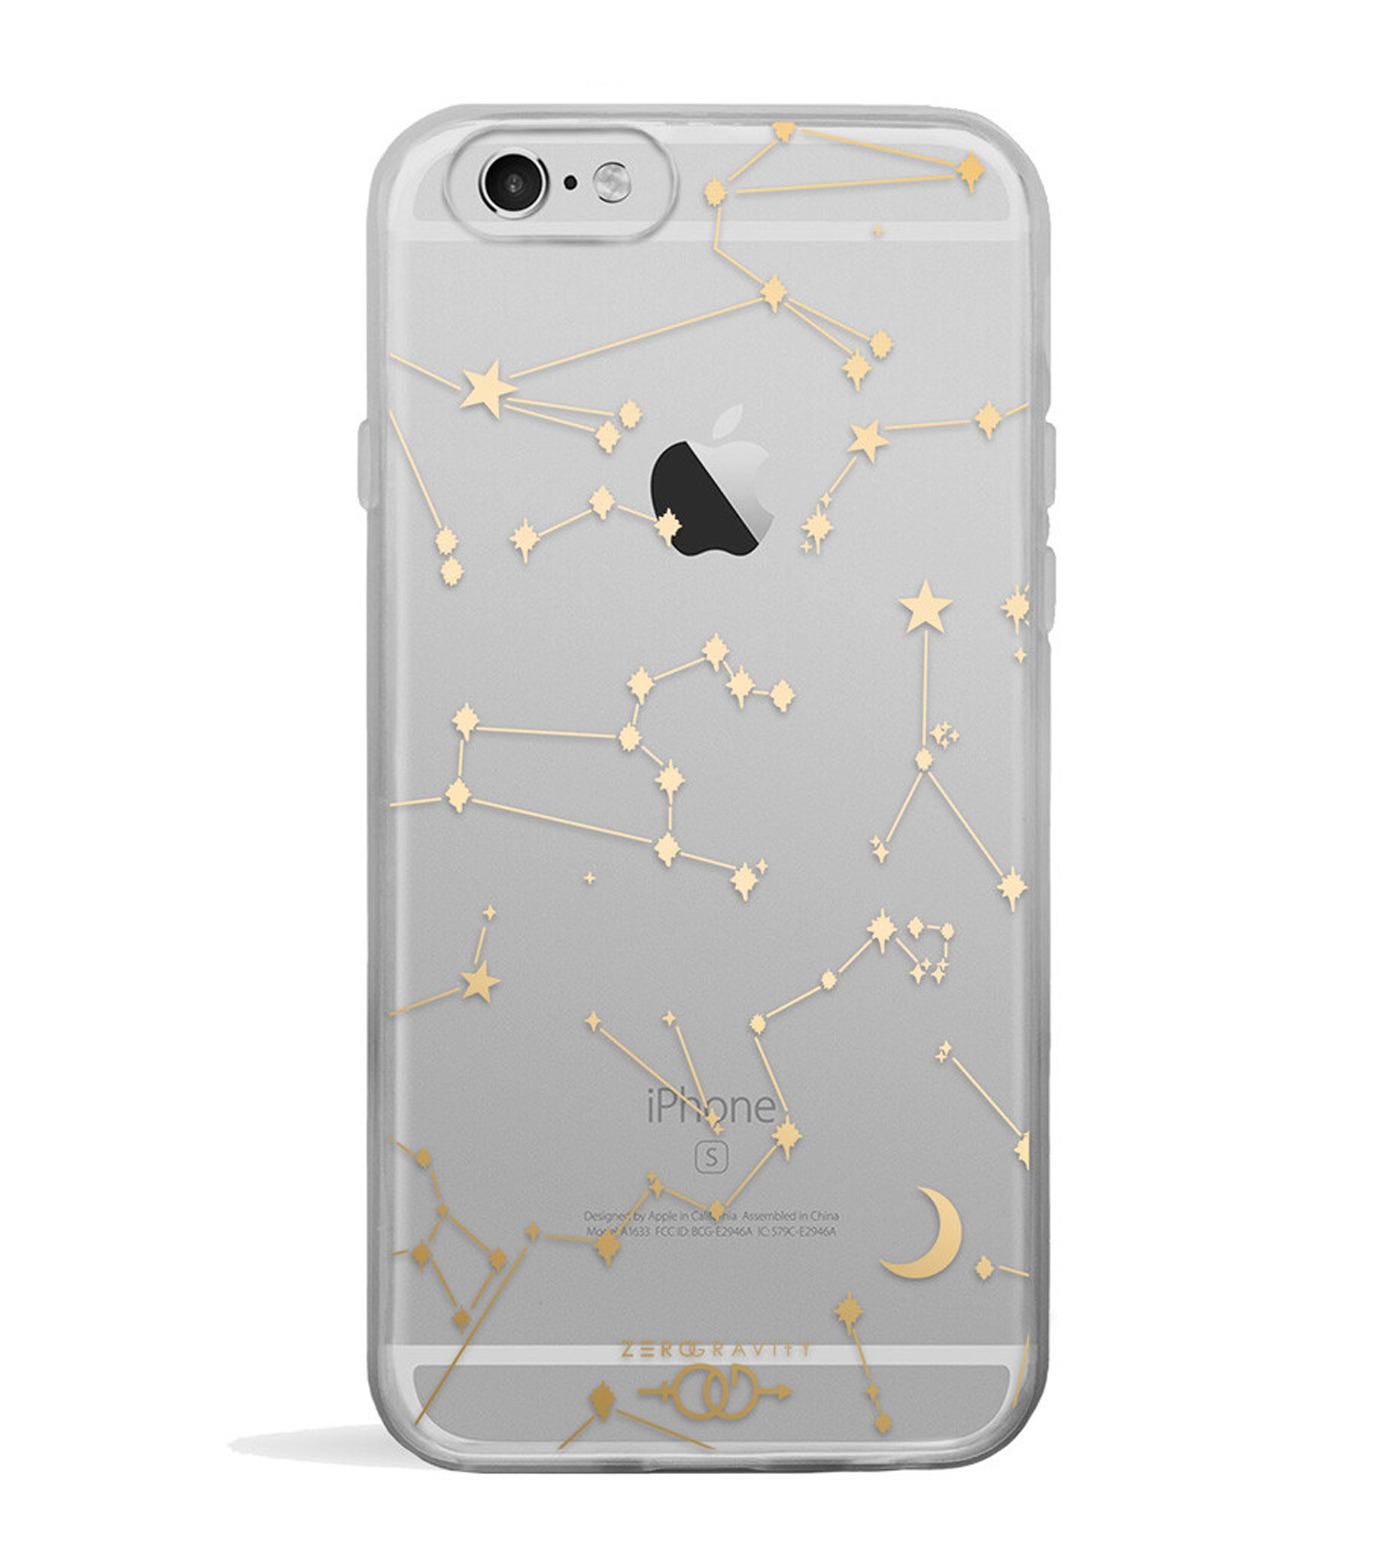 ZERO GRAVITY(ゼログラビティ)のORION for iPhone6/6S-NONE(ケースiphone6/6s/case iphone6/6s)-ORION6-0 拡大詳細画像1